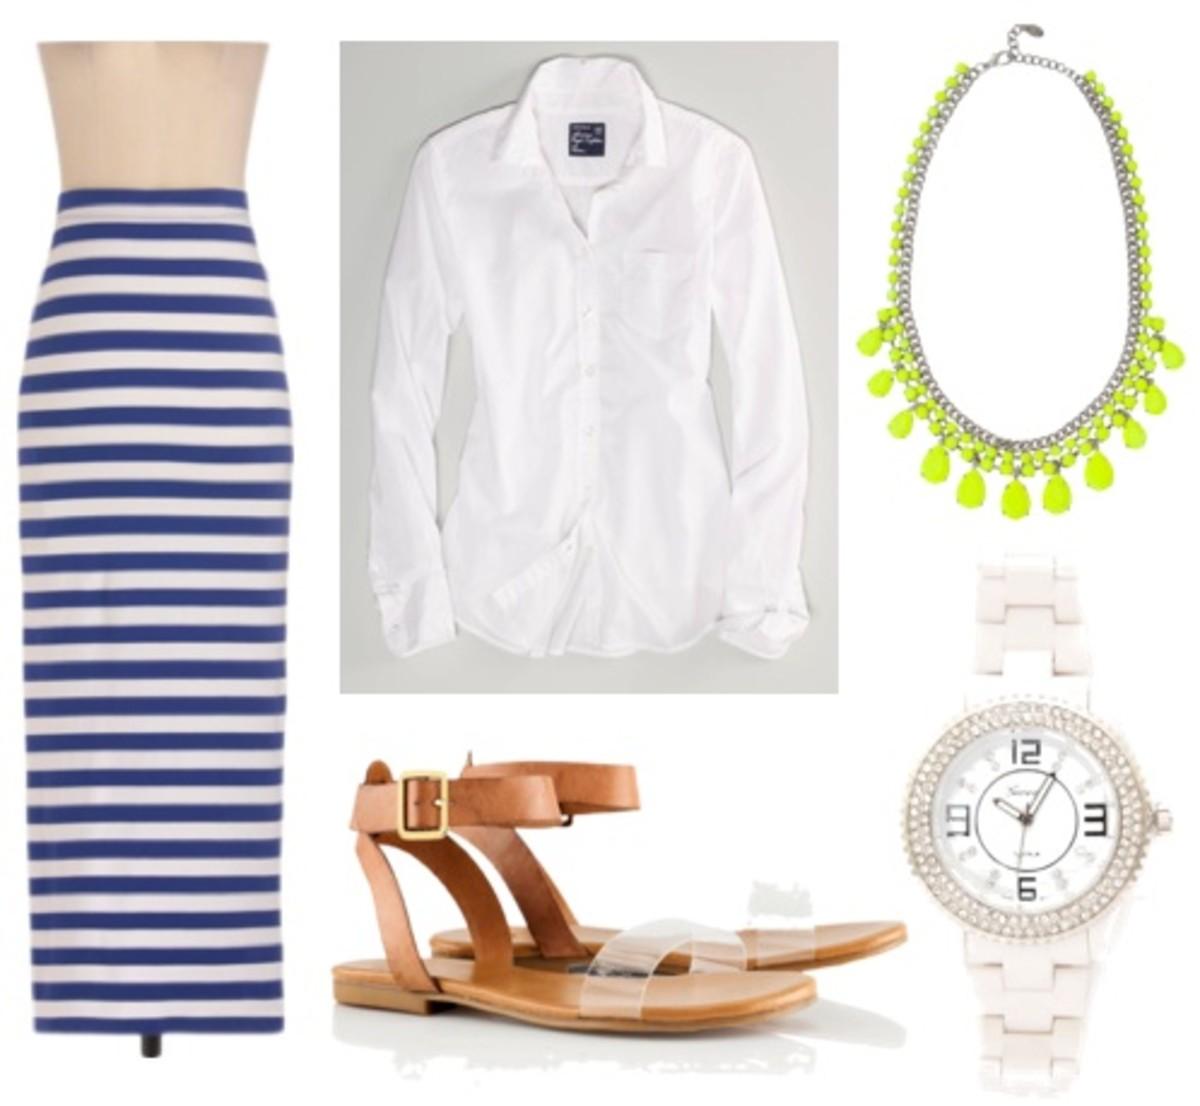 white-collared-shirt-bib-necklace-watch-stripe-tan-shoe-sandals-blue-med-maxi-skirt-spring-summer-lunch.jpg